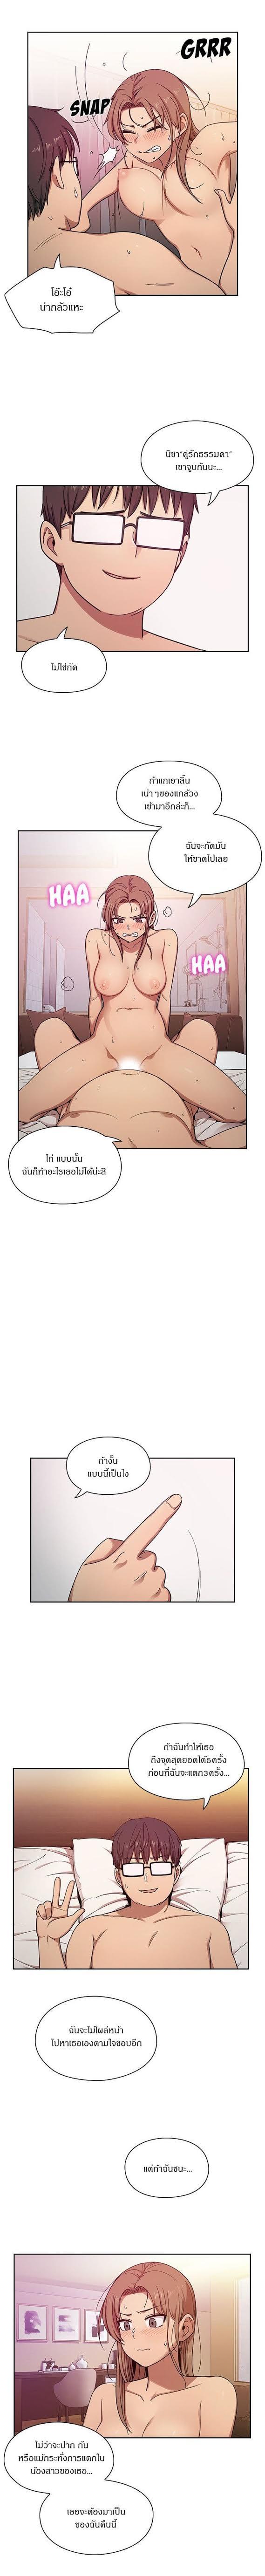 Crime and Punishment - หน้า 10